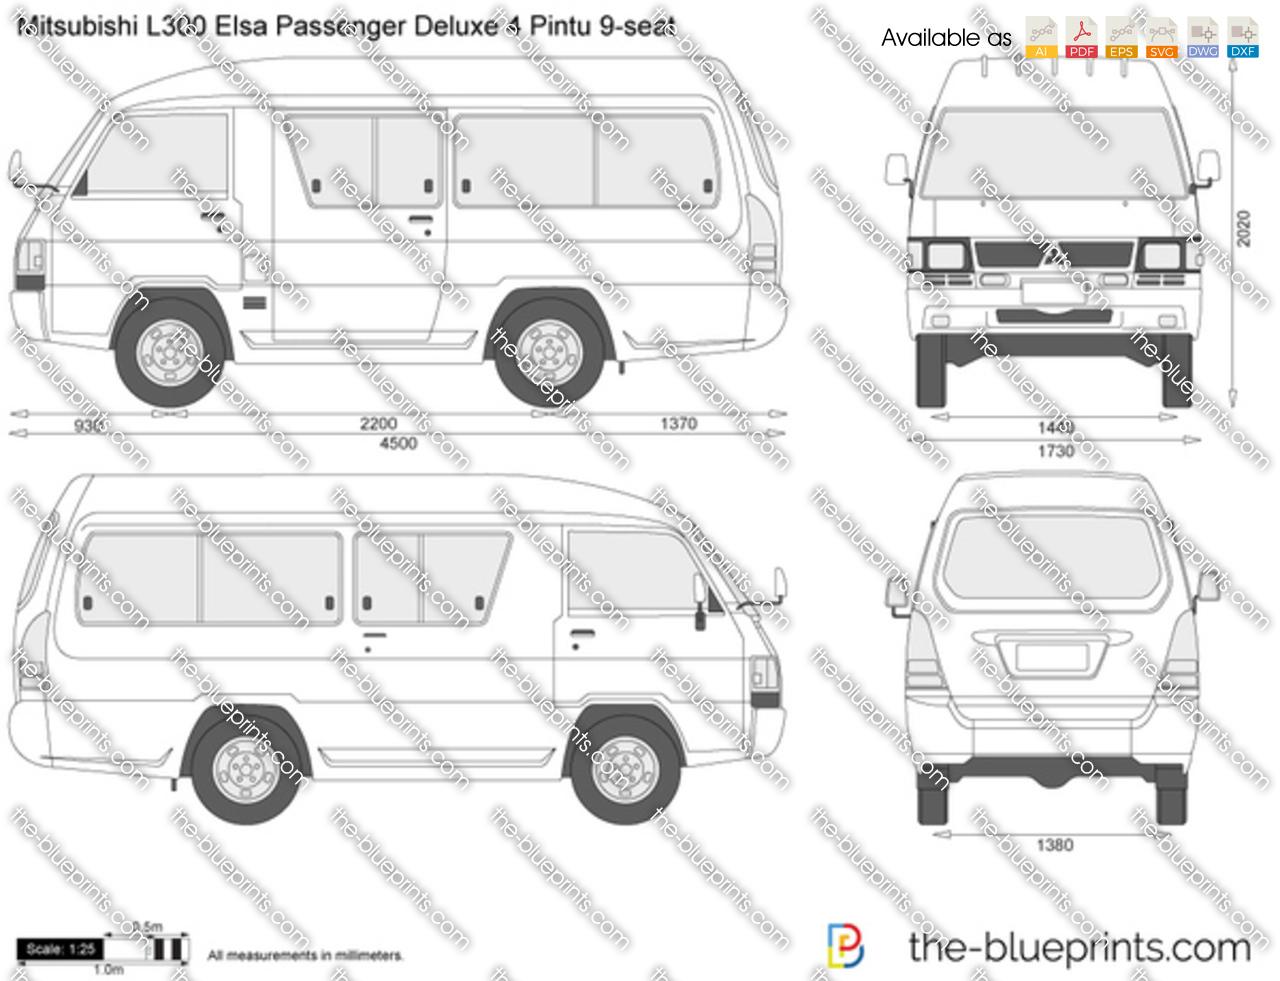 Mitsubishi L300 Elsa Passenger Deluxe 4 Pintu 9-seat 2015